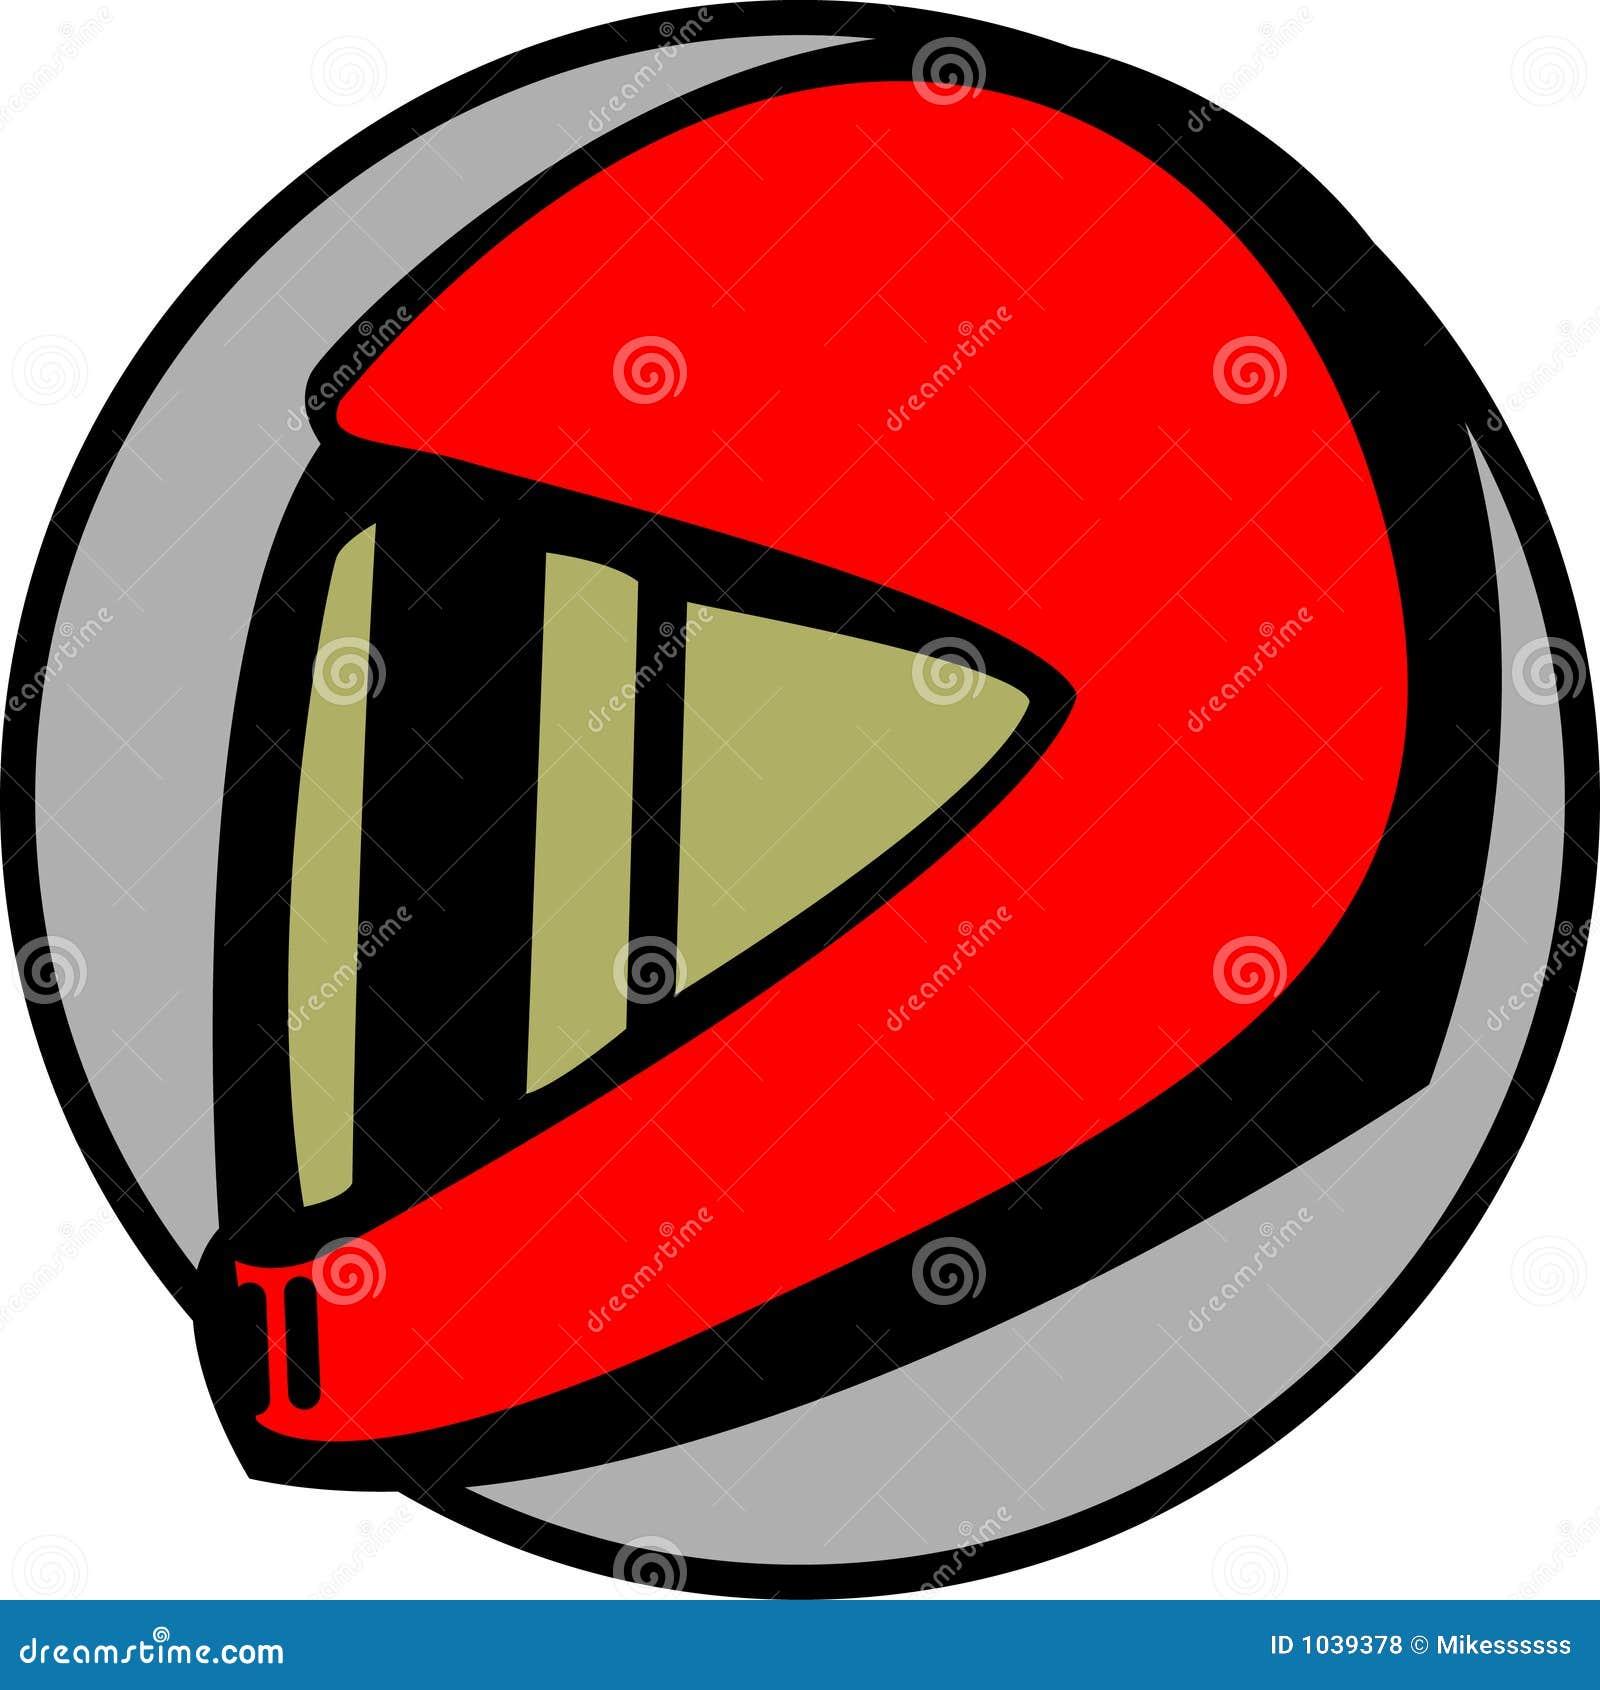 racing the clock clip art video - photo #27